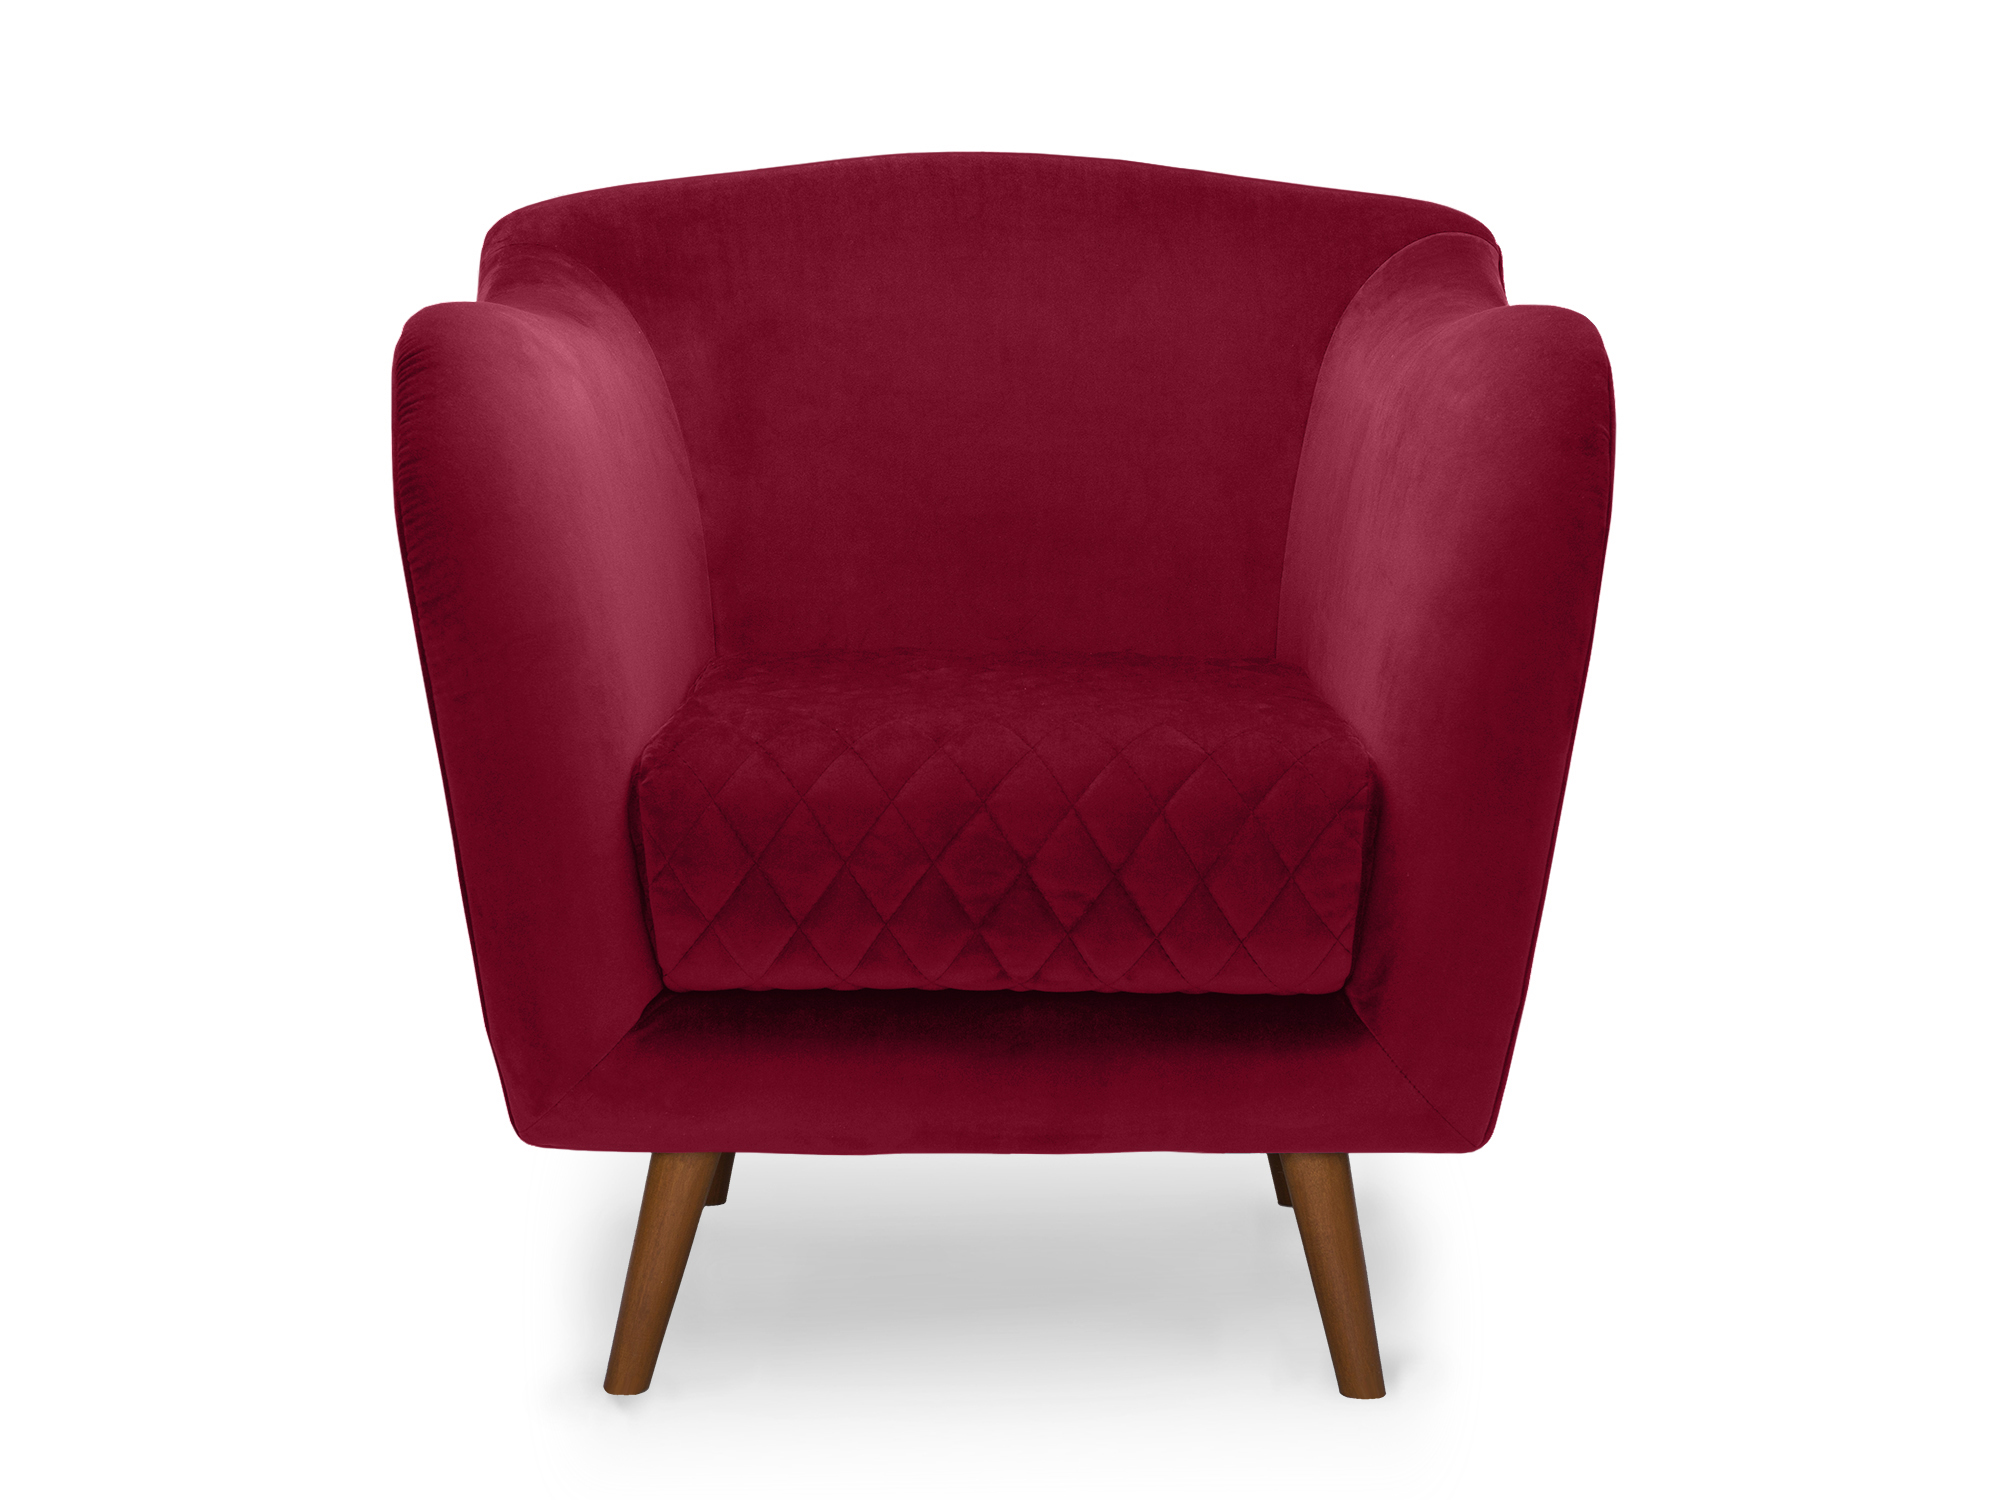 Кресло MyFurnish 15435639 от thefurnish